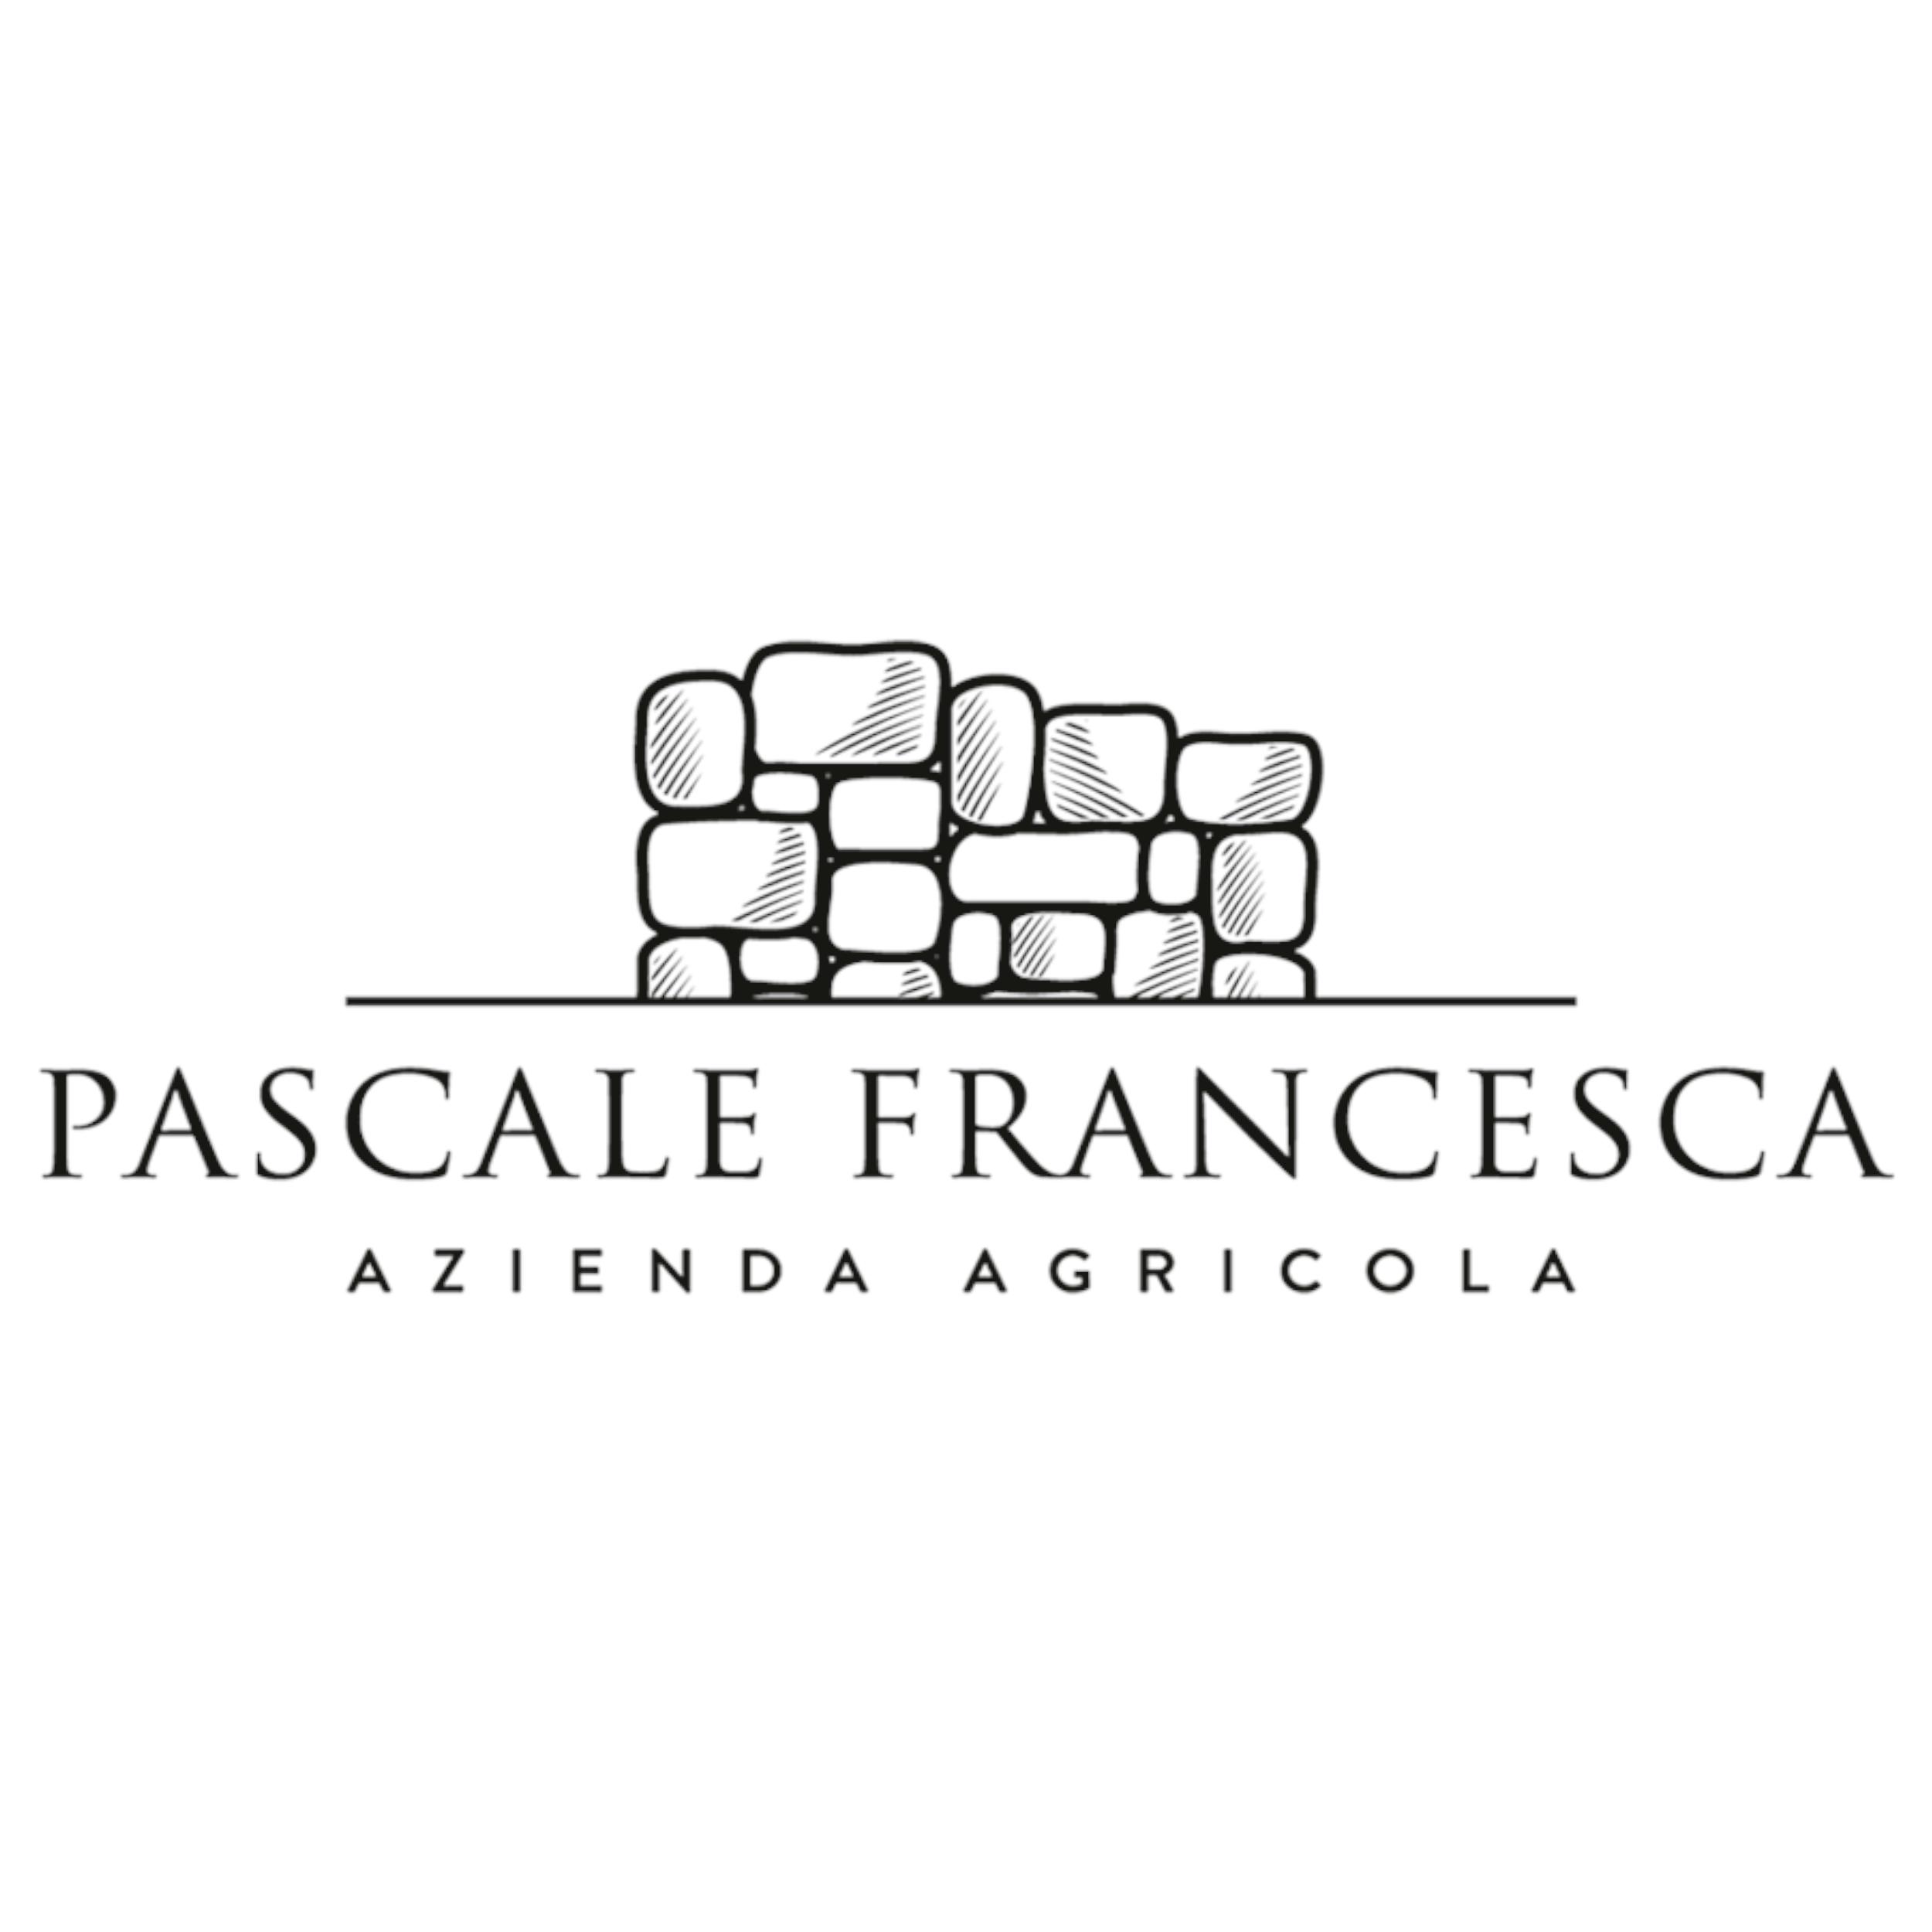 I PILASTRI - PASCALE FRANCESCA